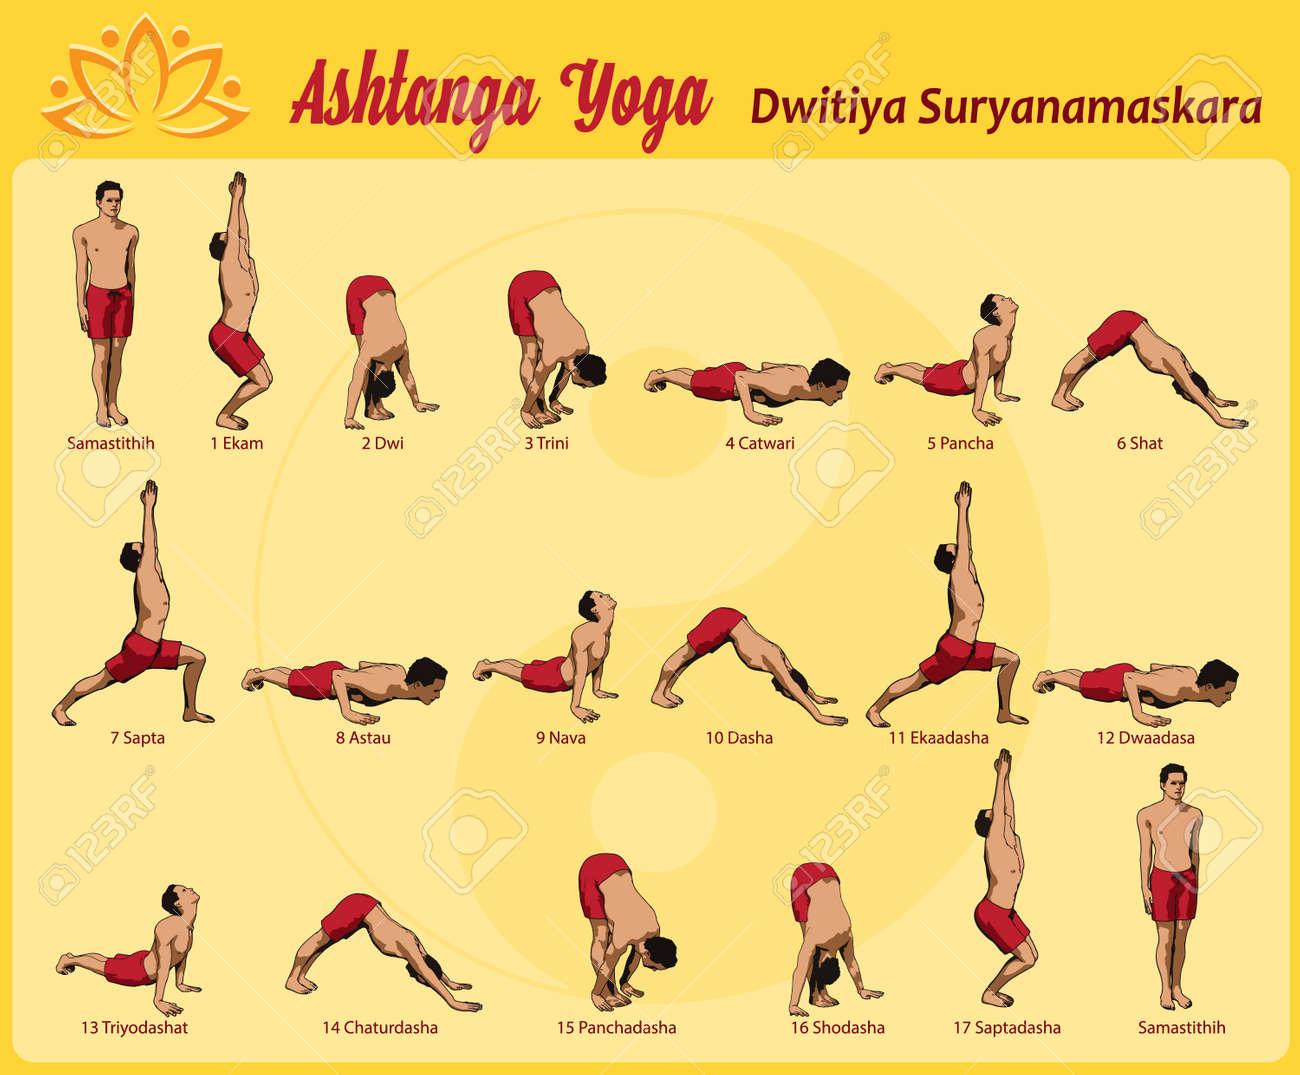 Ommon Sequence Of Asanas In The Practice Yoga Surya Namaskar Stock Vector